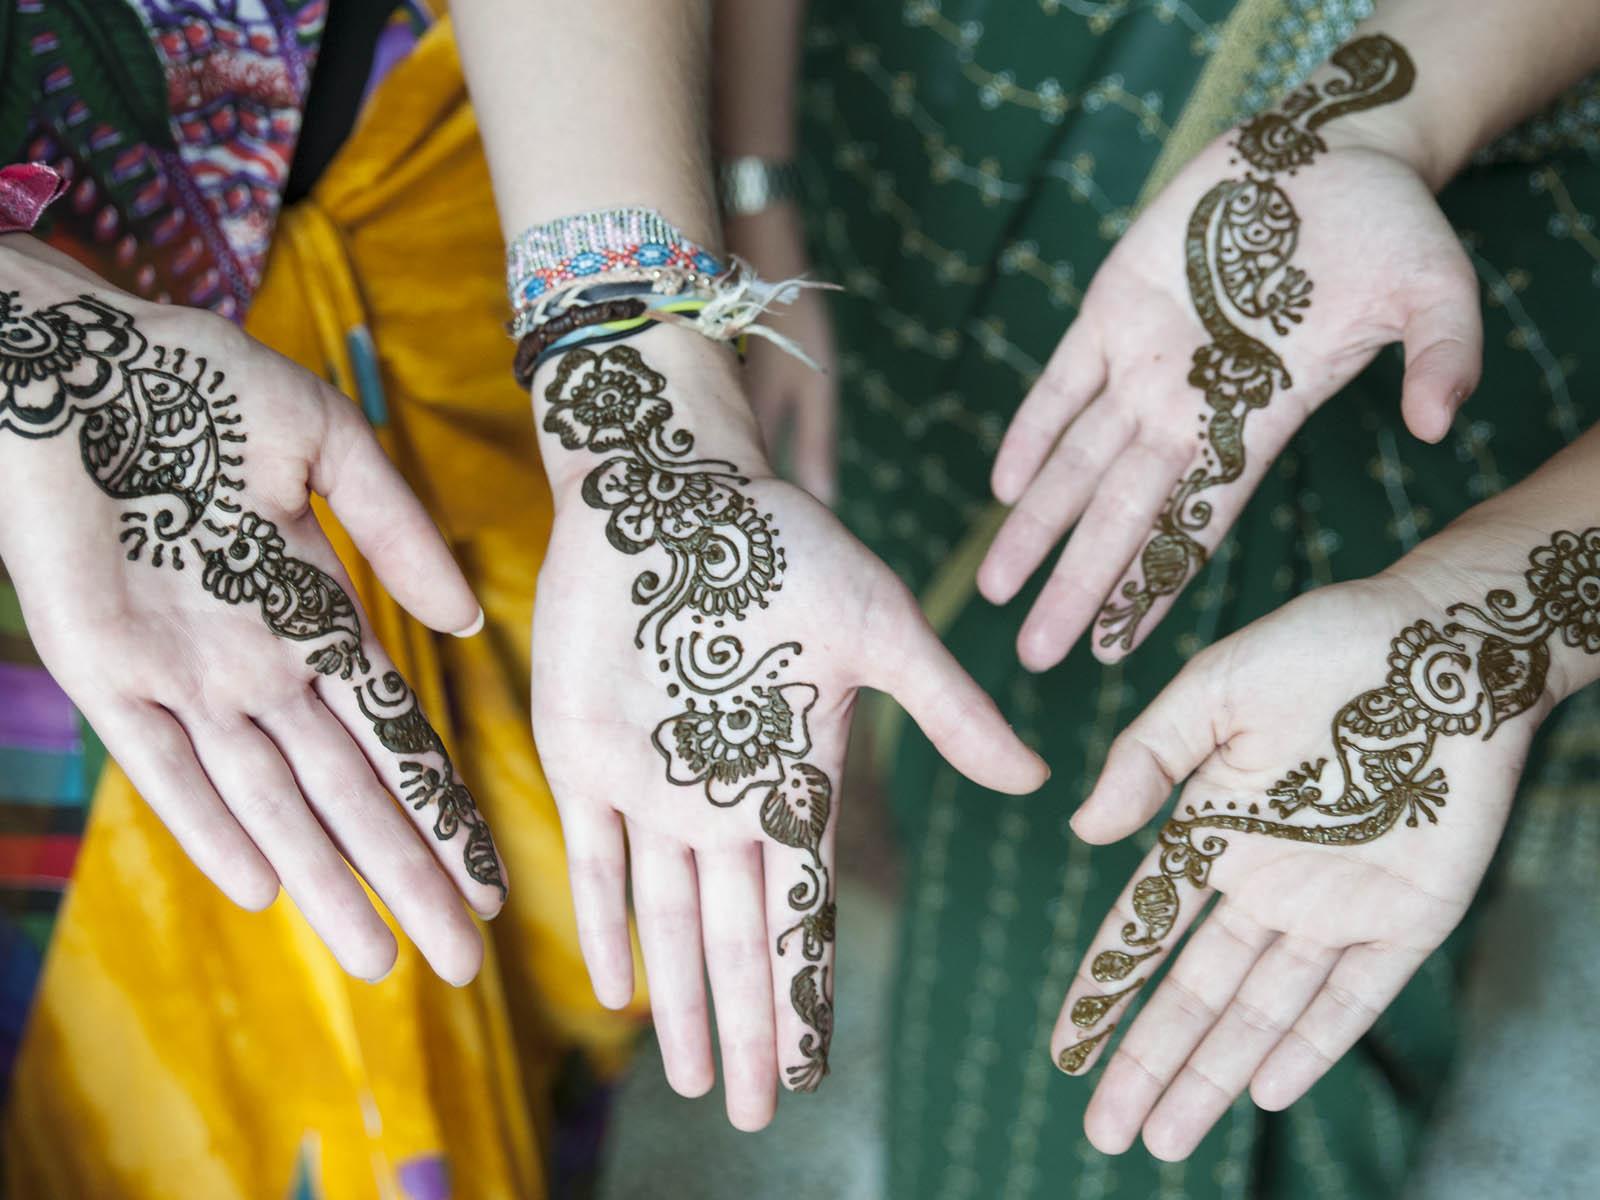 The girls enjoyed getting their Henna Tattoos!